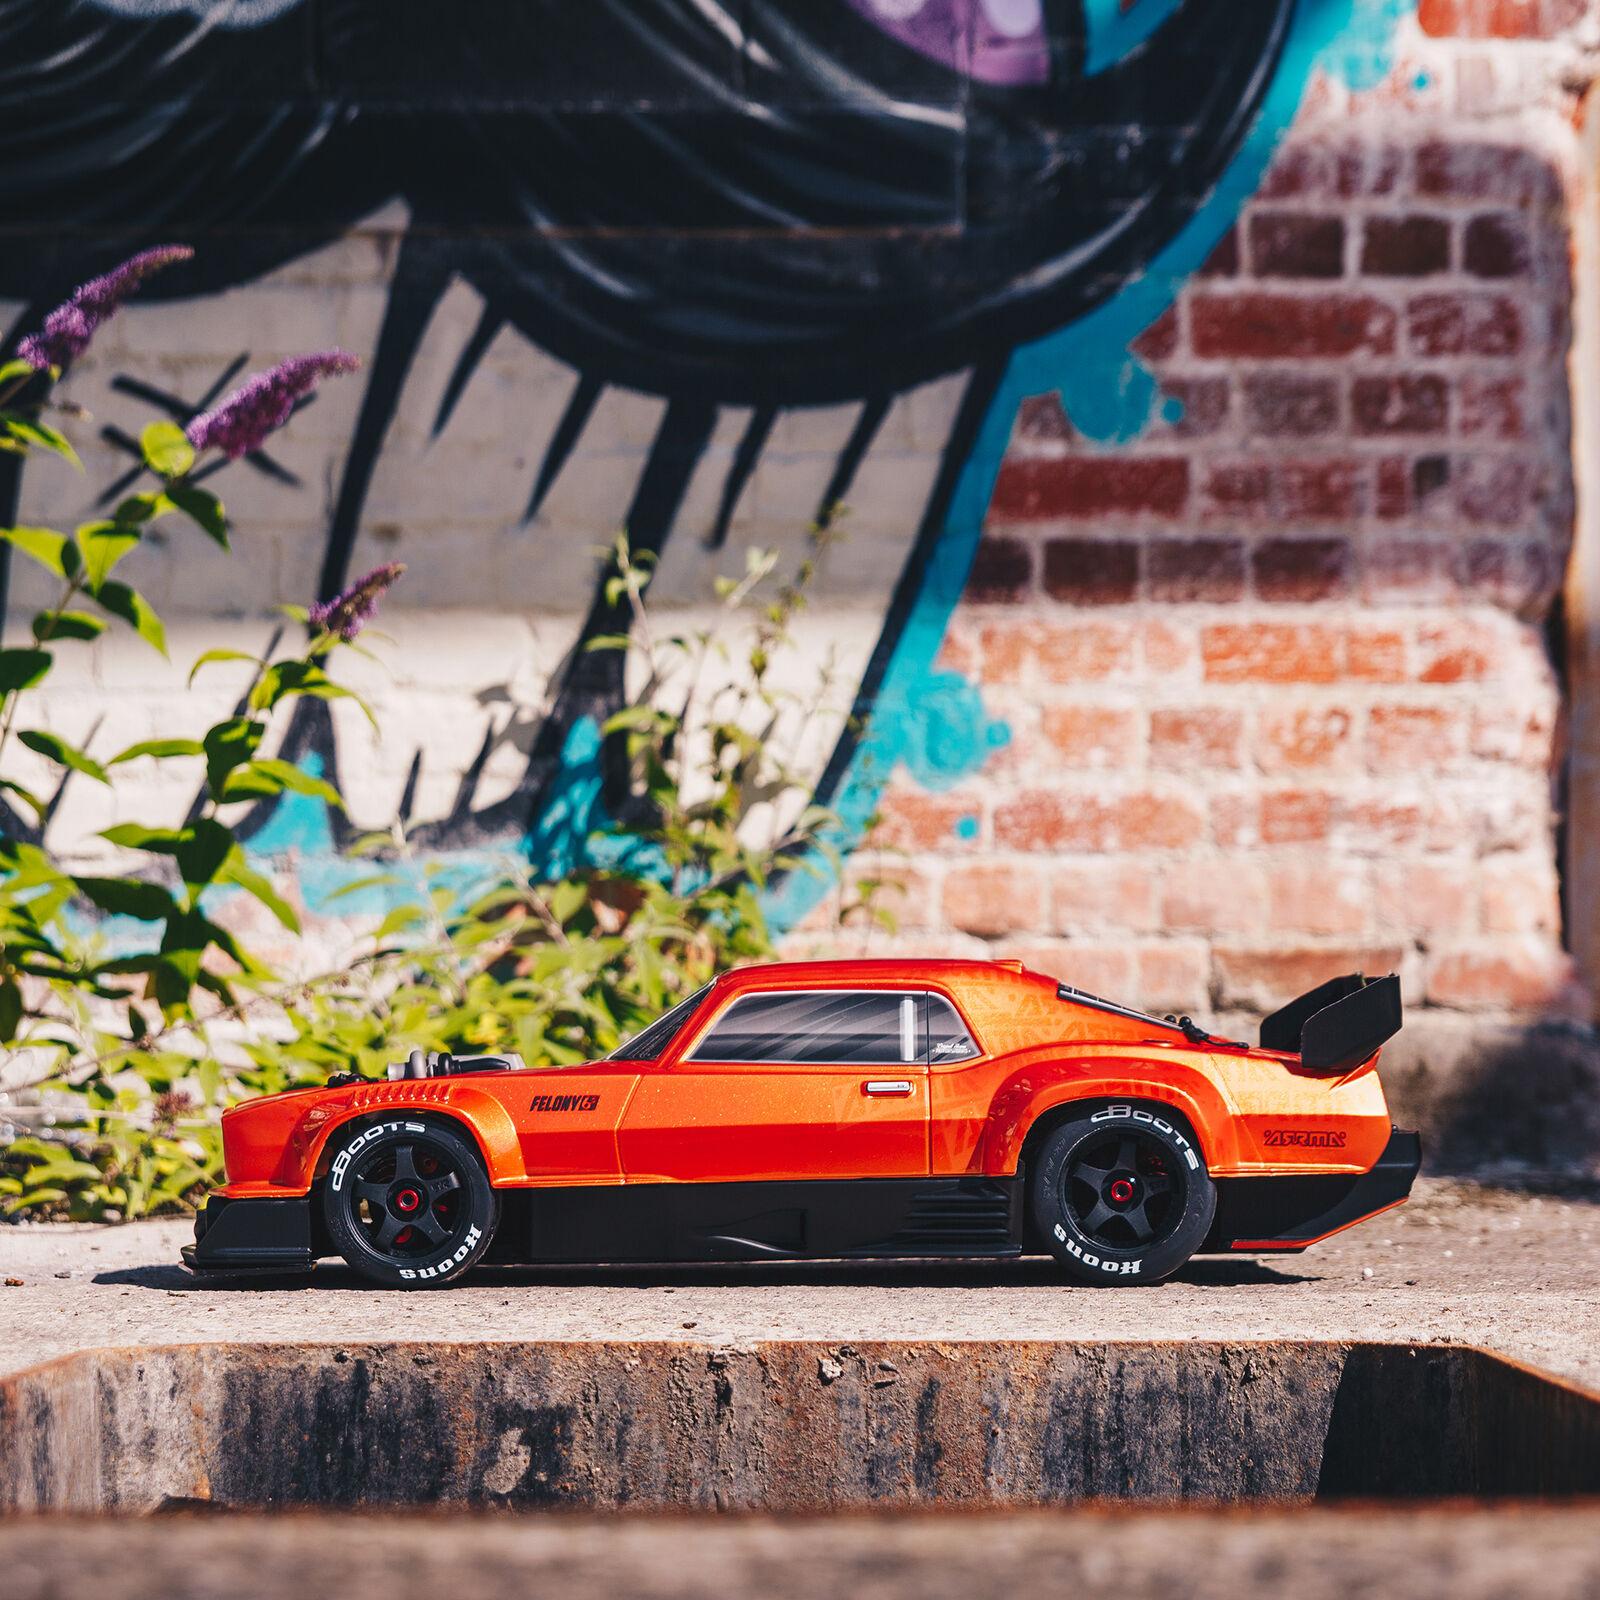 1/7 FELONY 6S BLX Street Bash All-Road Muscle Car RTR, Orange